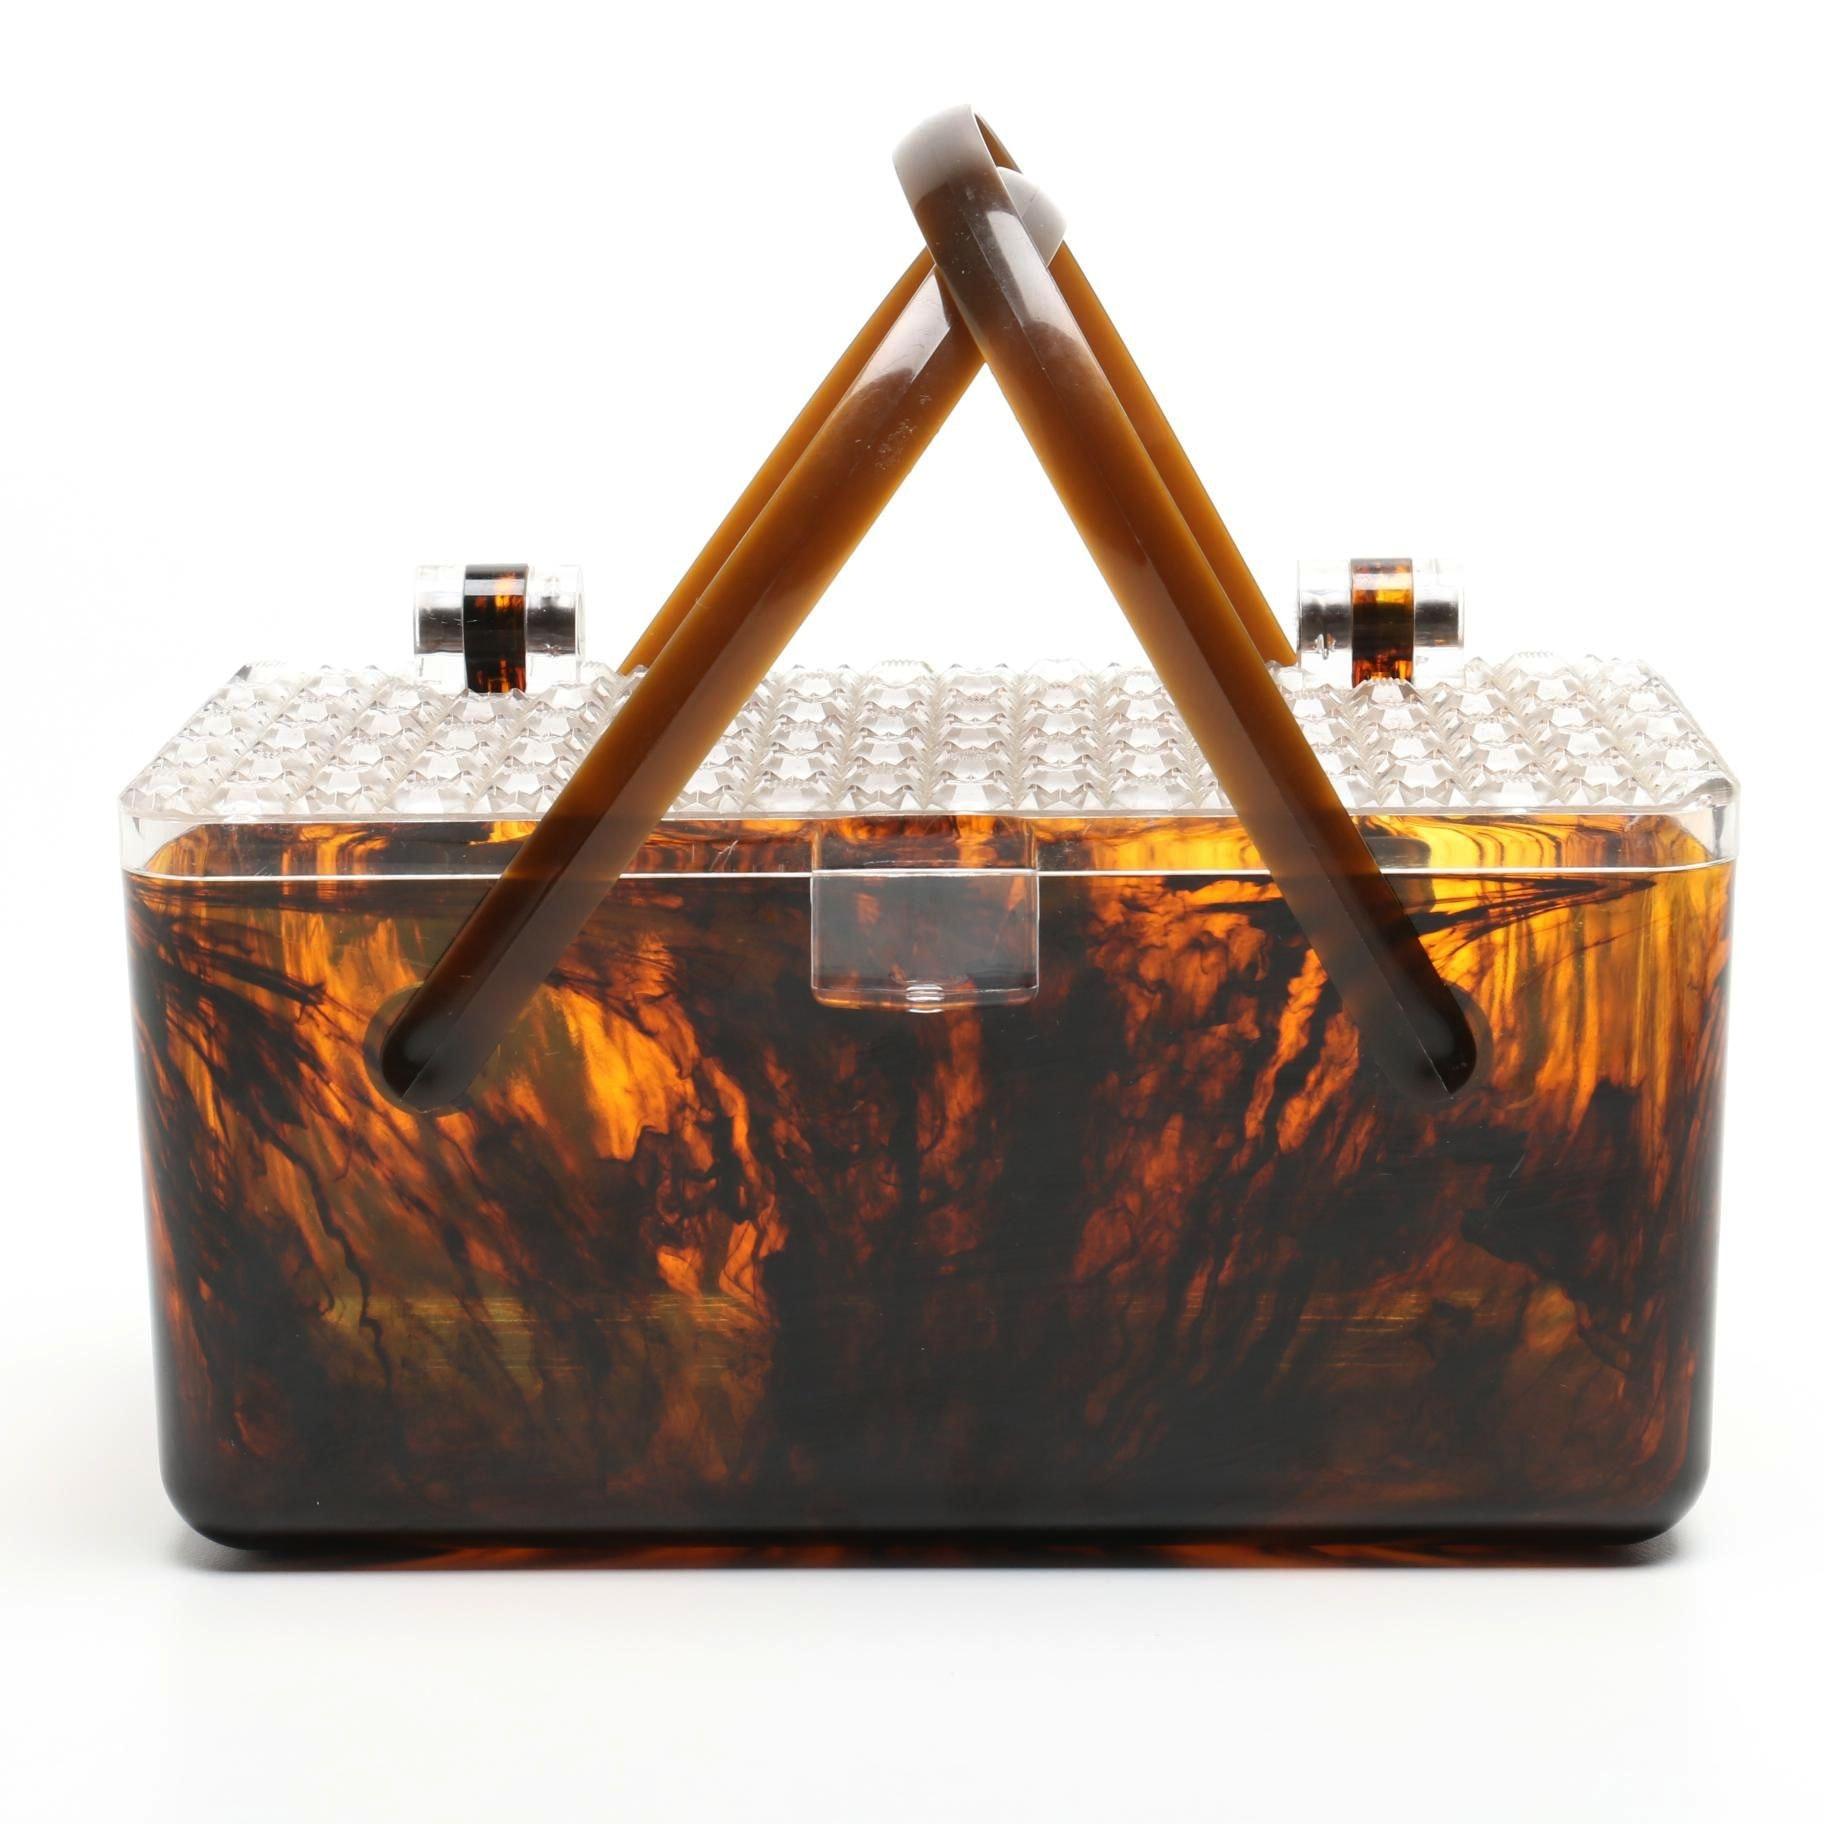 Vintage Tortoiseshell-Style Acrylic Box Purse with Geometric Lid